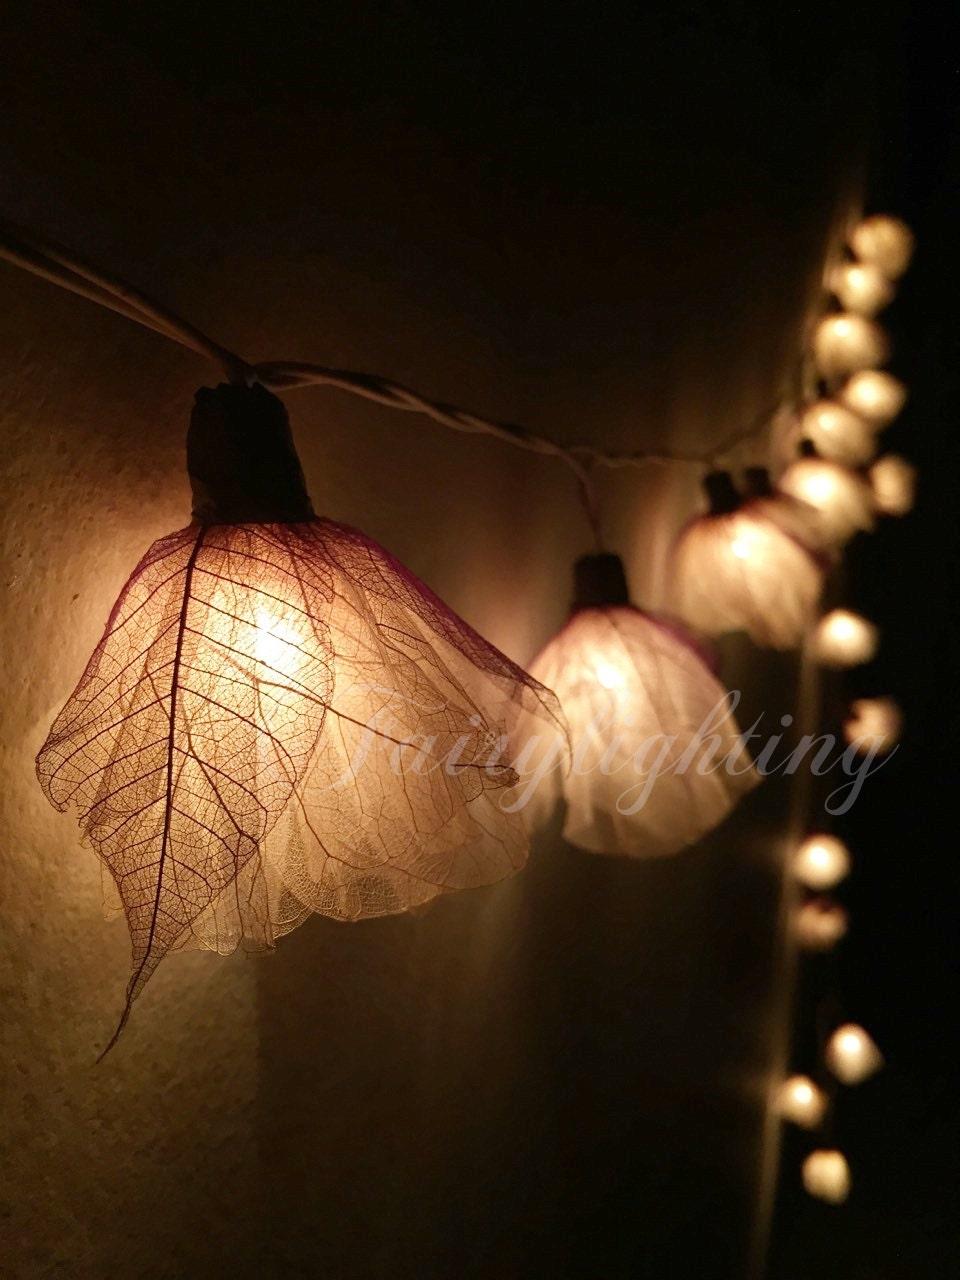 Fairy string lights 20 White Carnation Flower by fairylighting